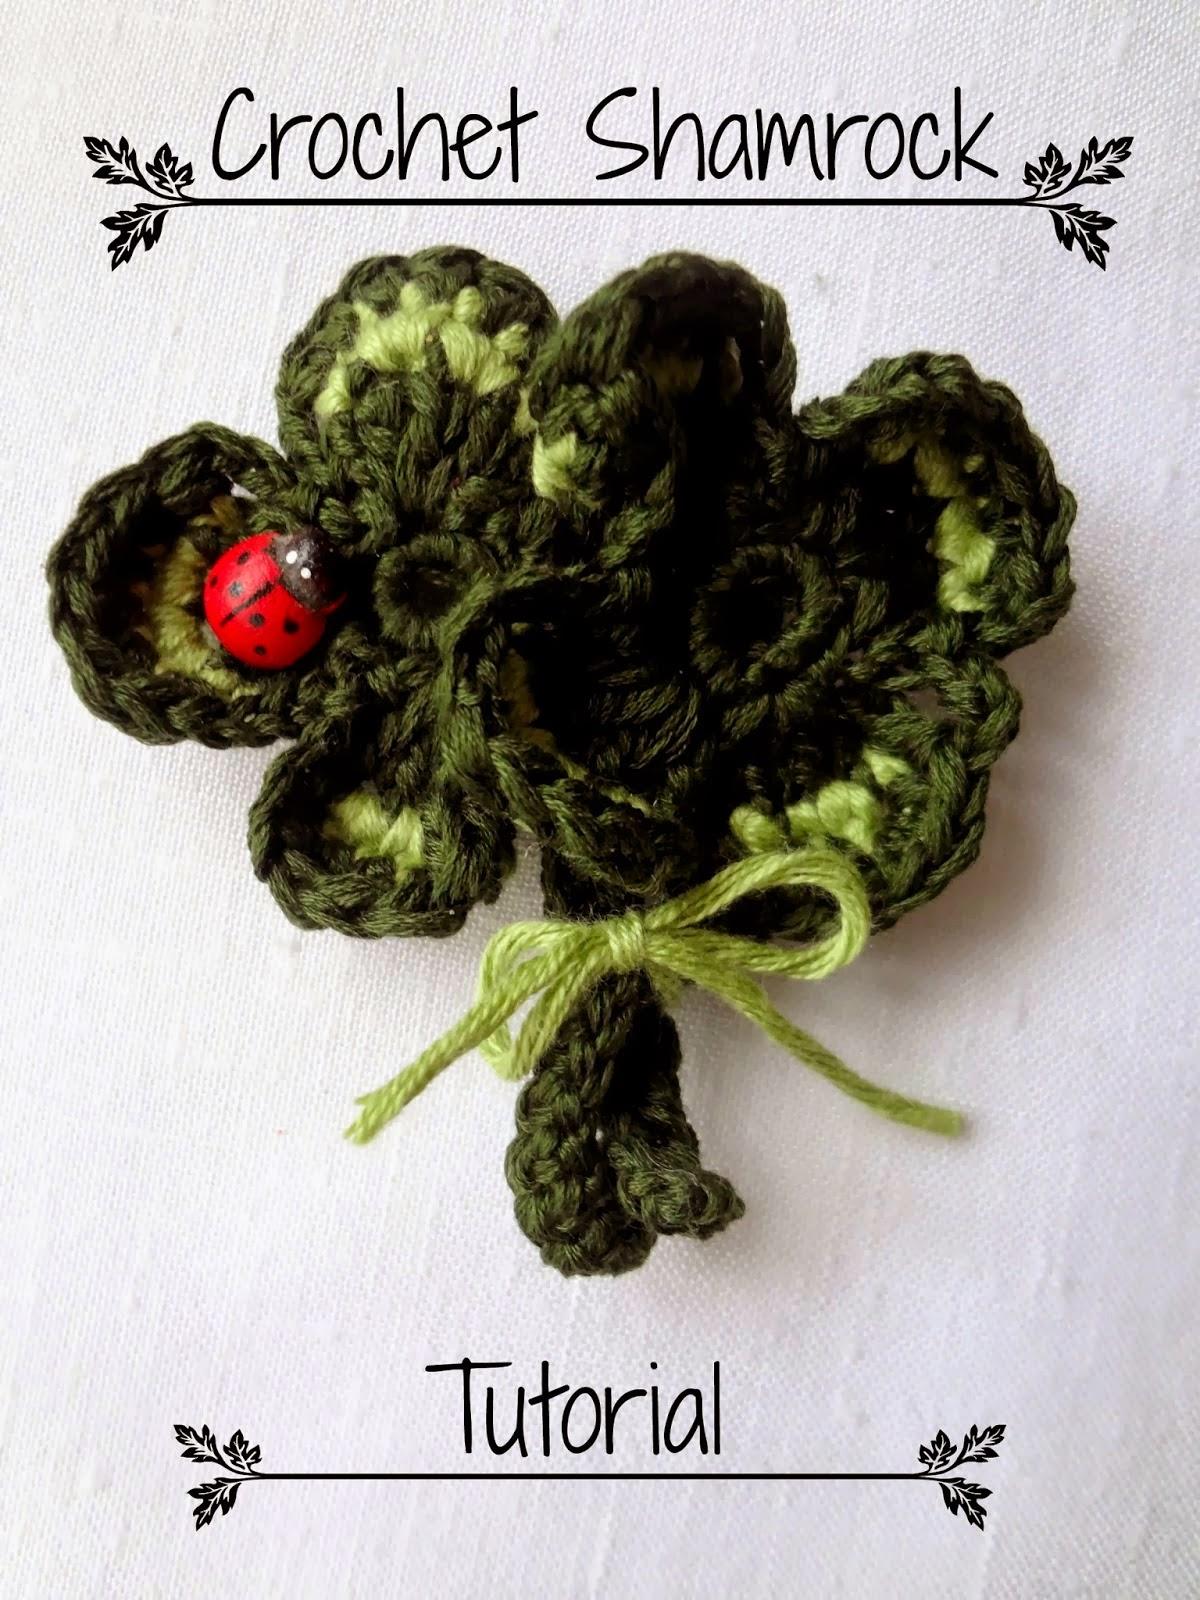 http://thelittletreasures.blogspot.com/2014/03/crochet-shamrock-tutorial-free.html